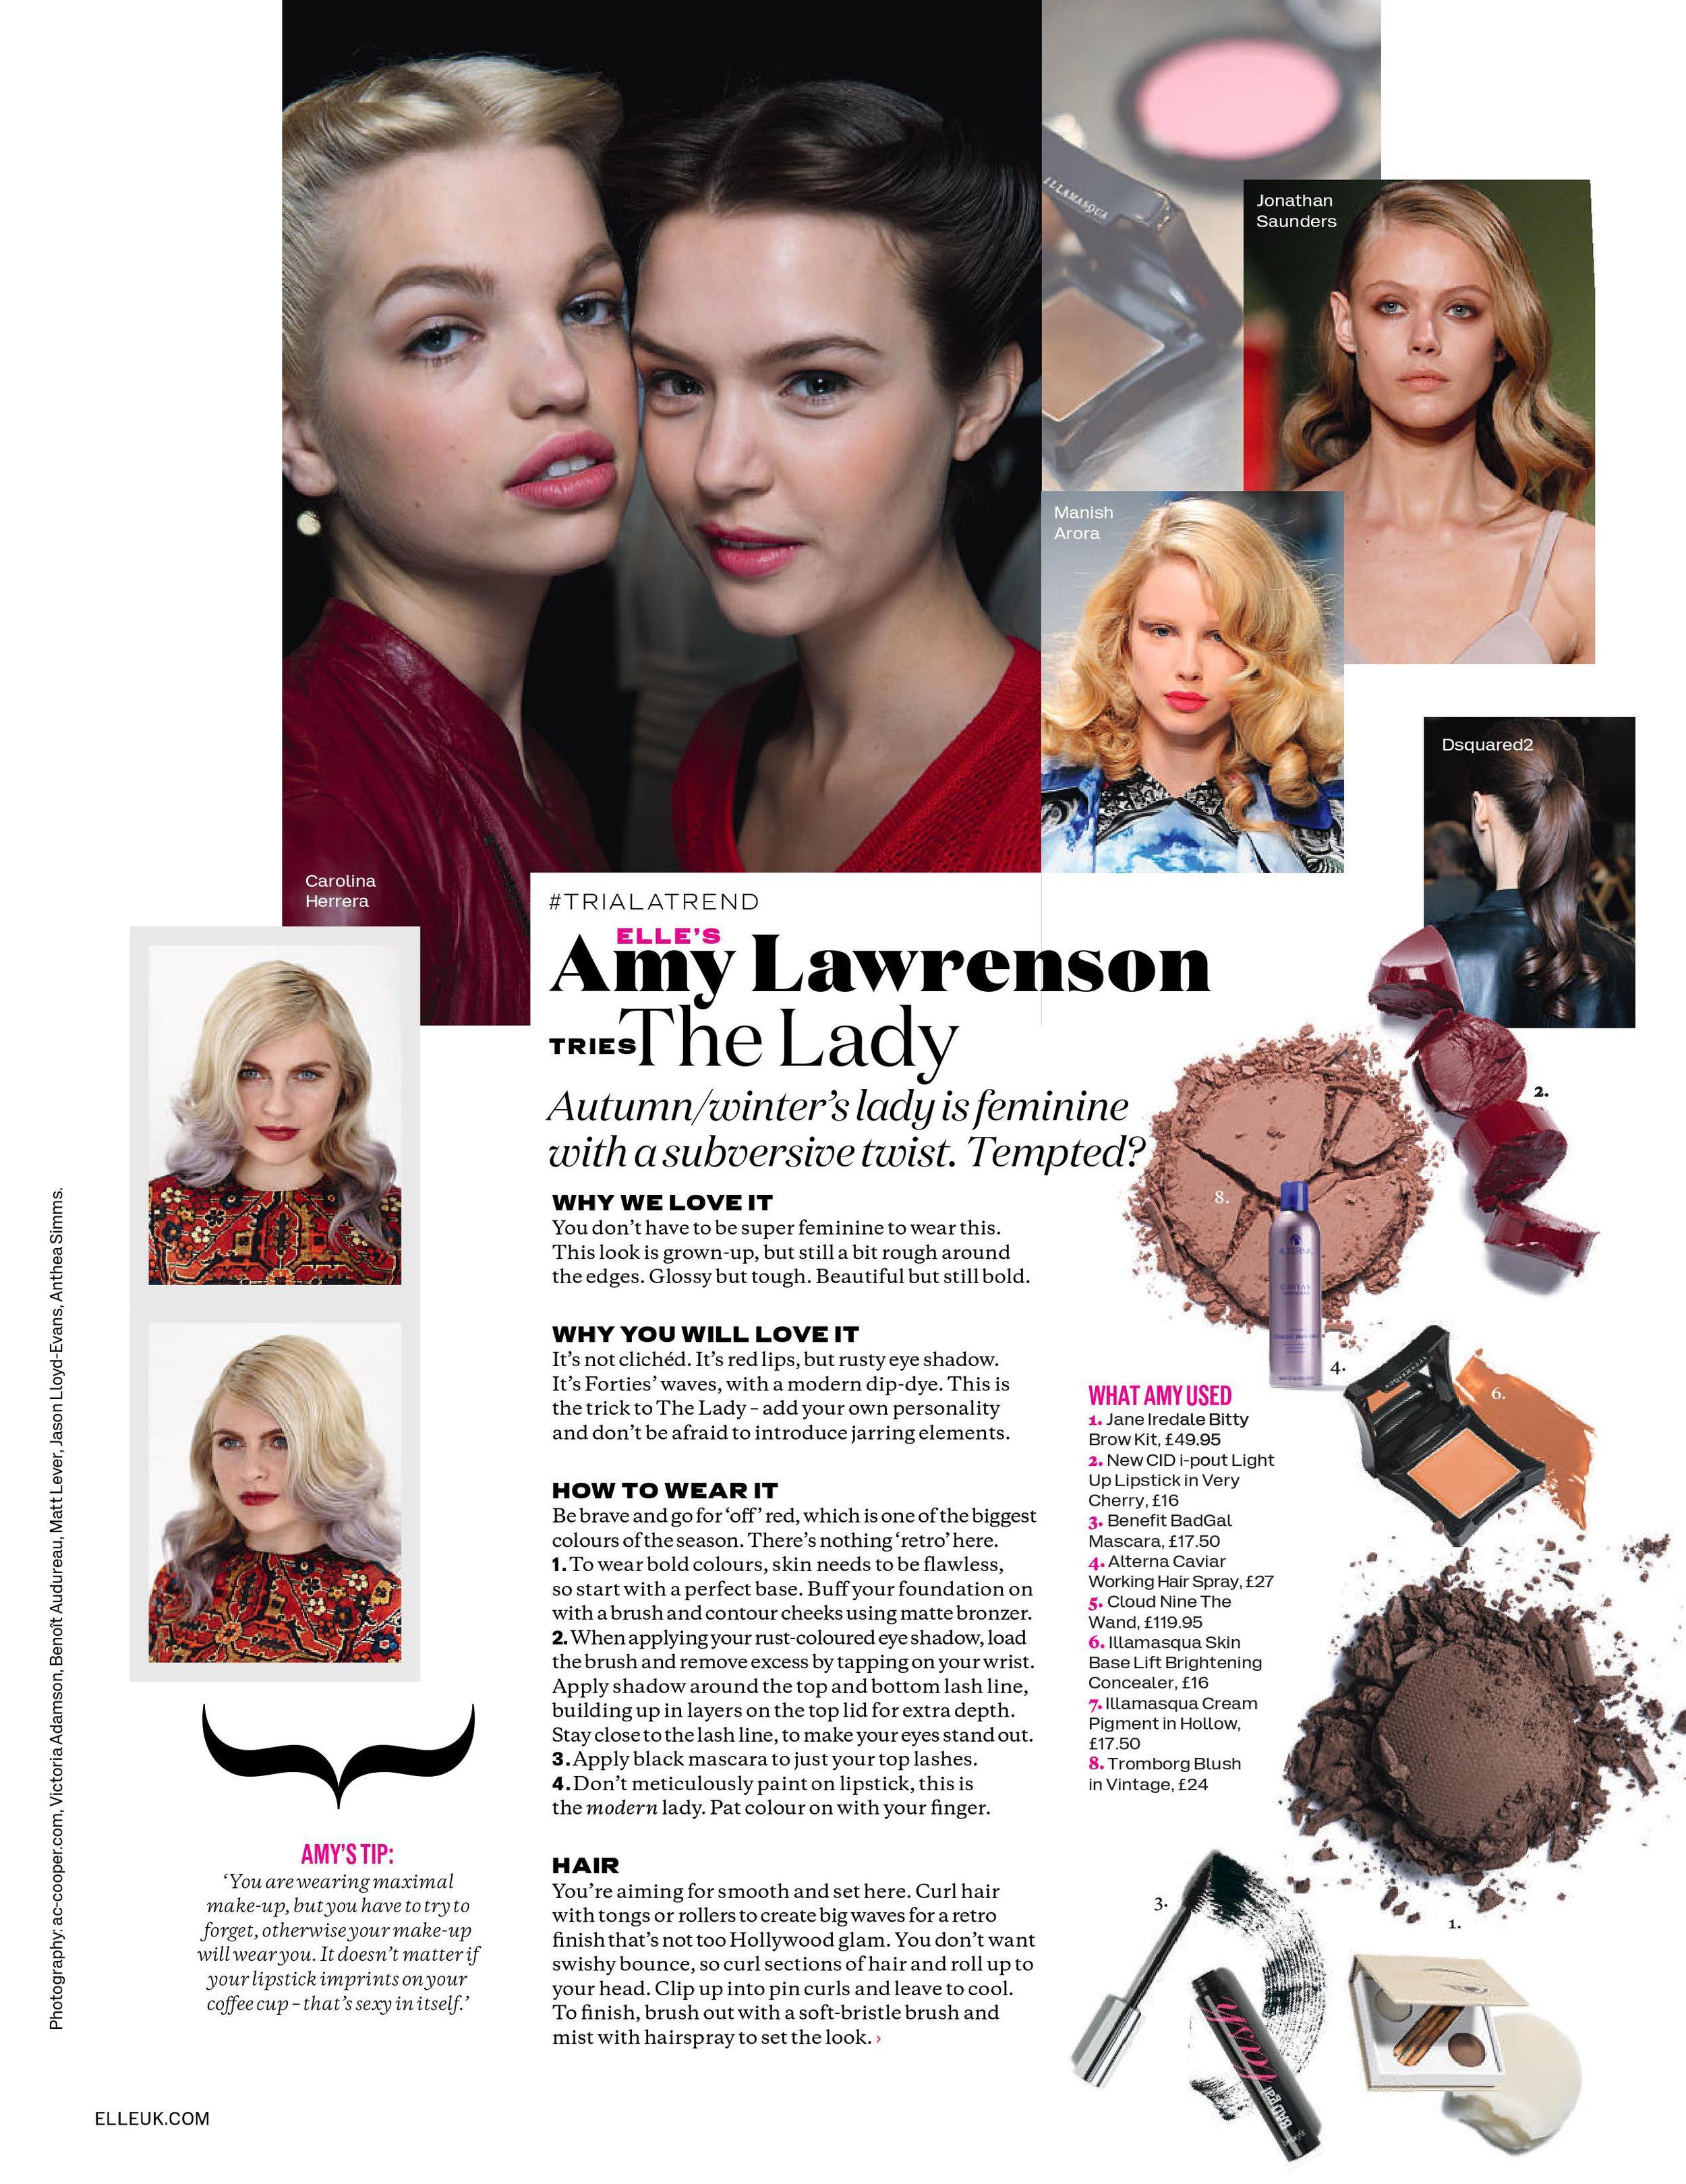 Amy Lawrenson Tries The Lady